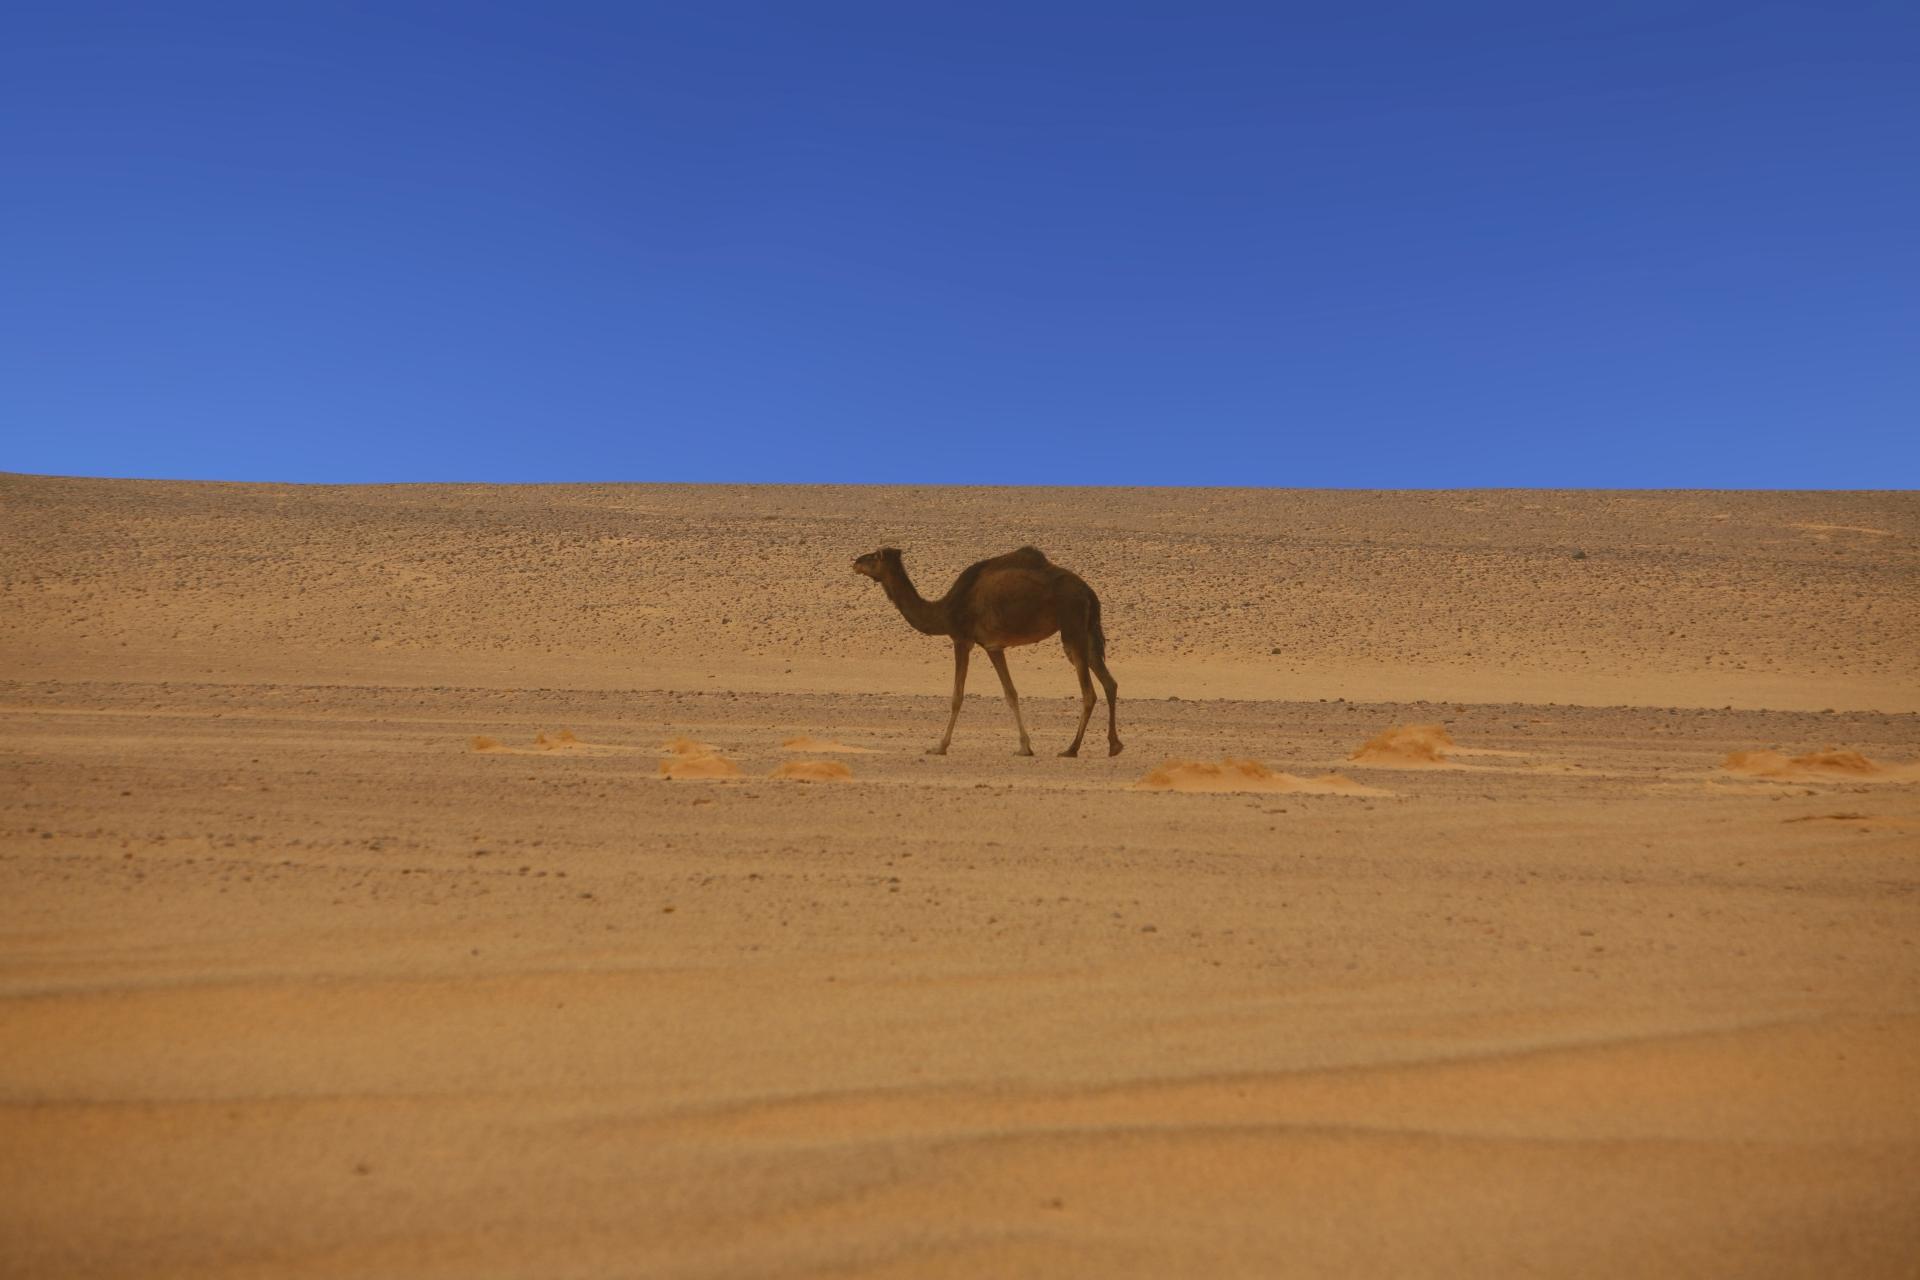 Libya 2007 # 03